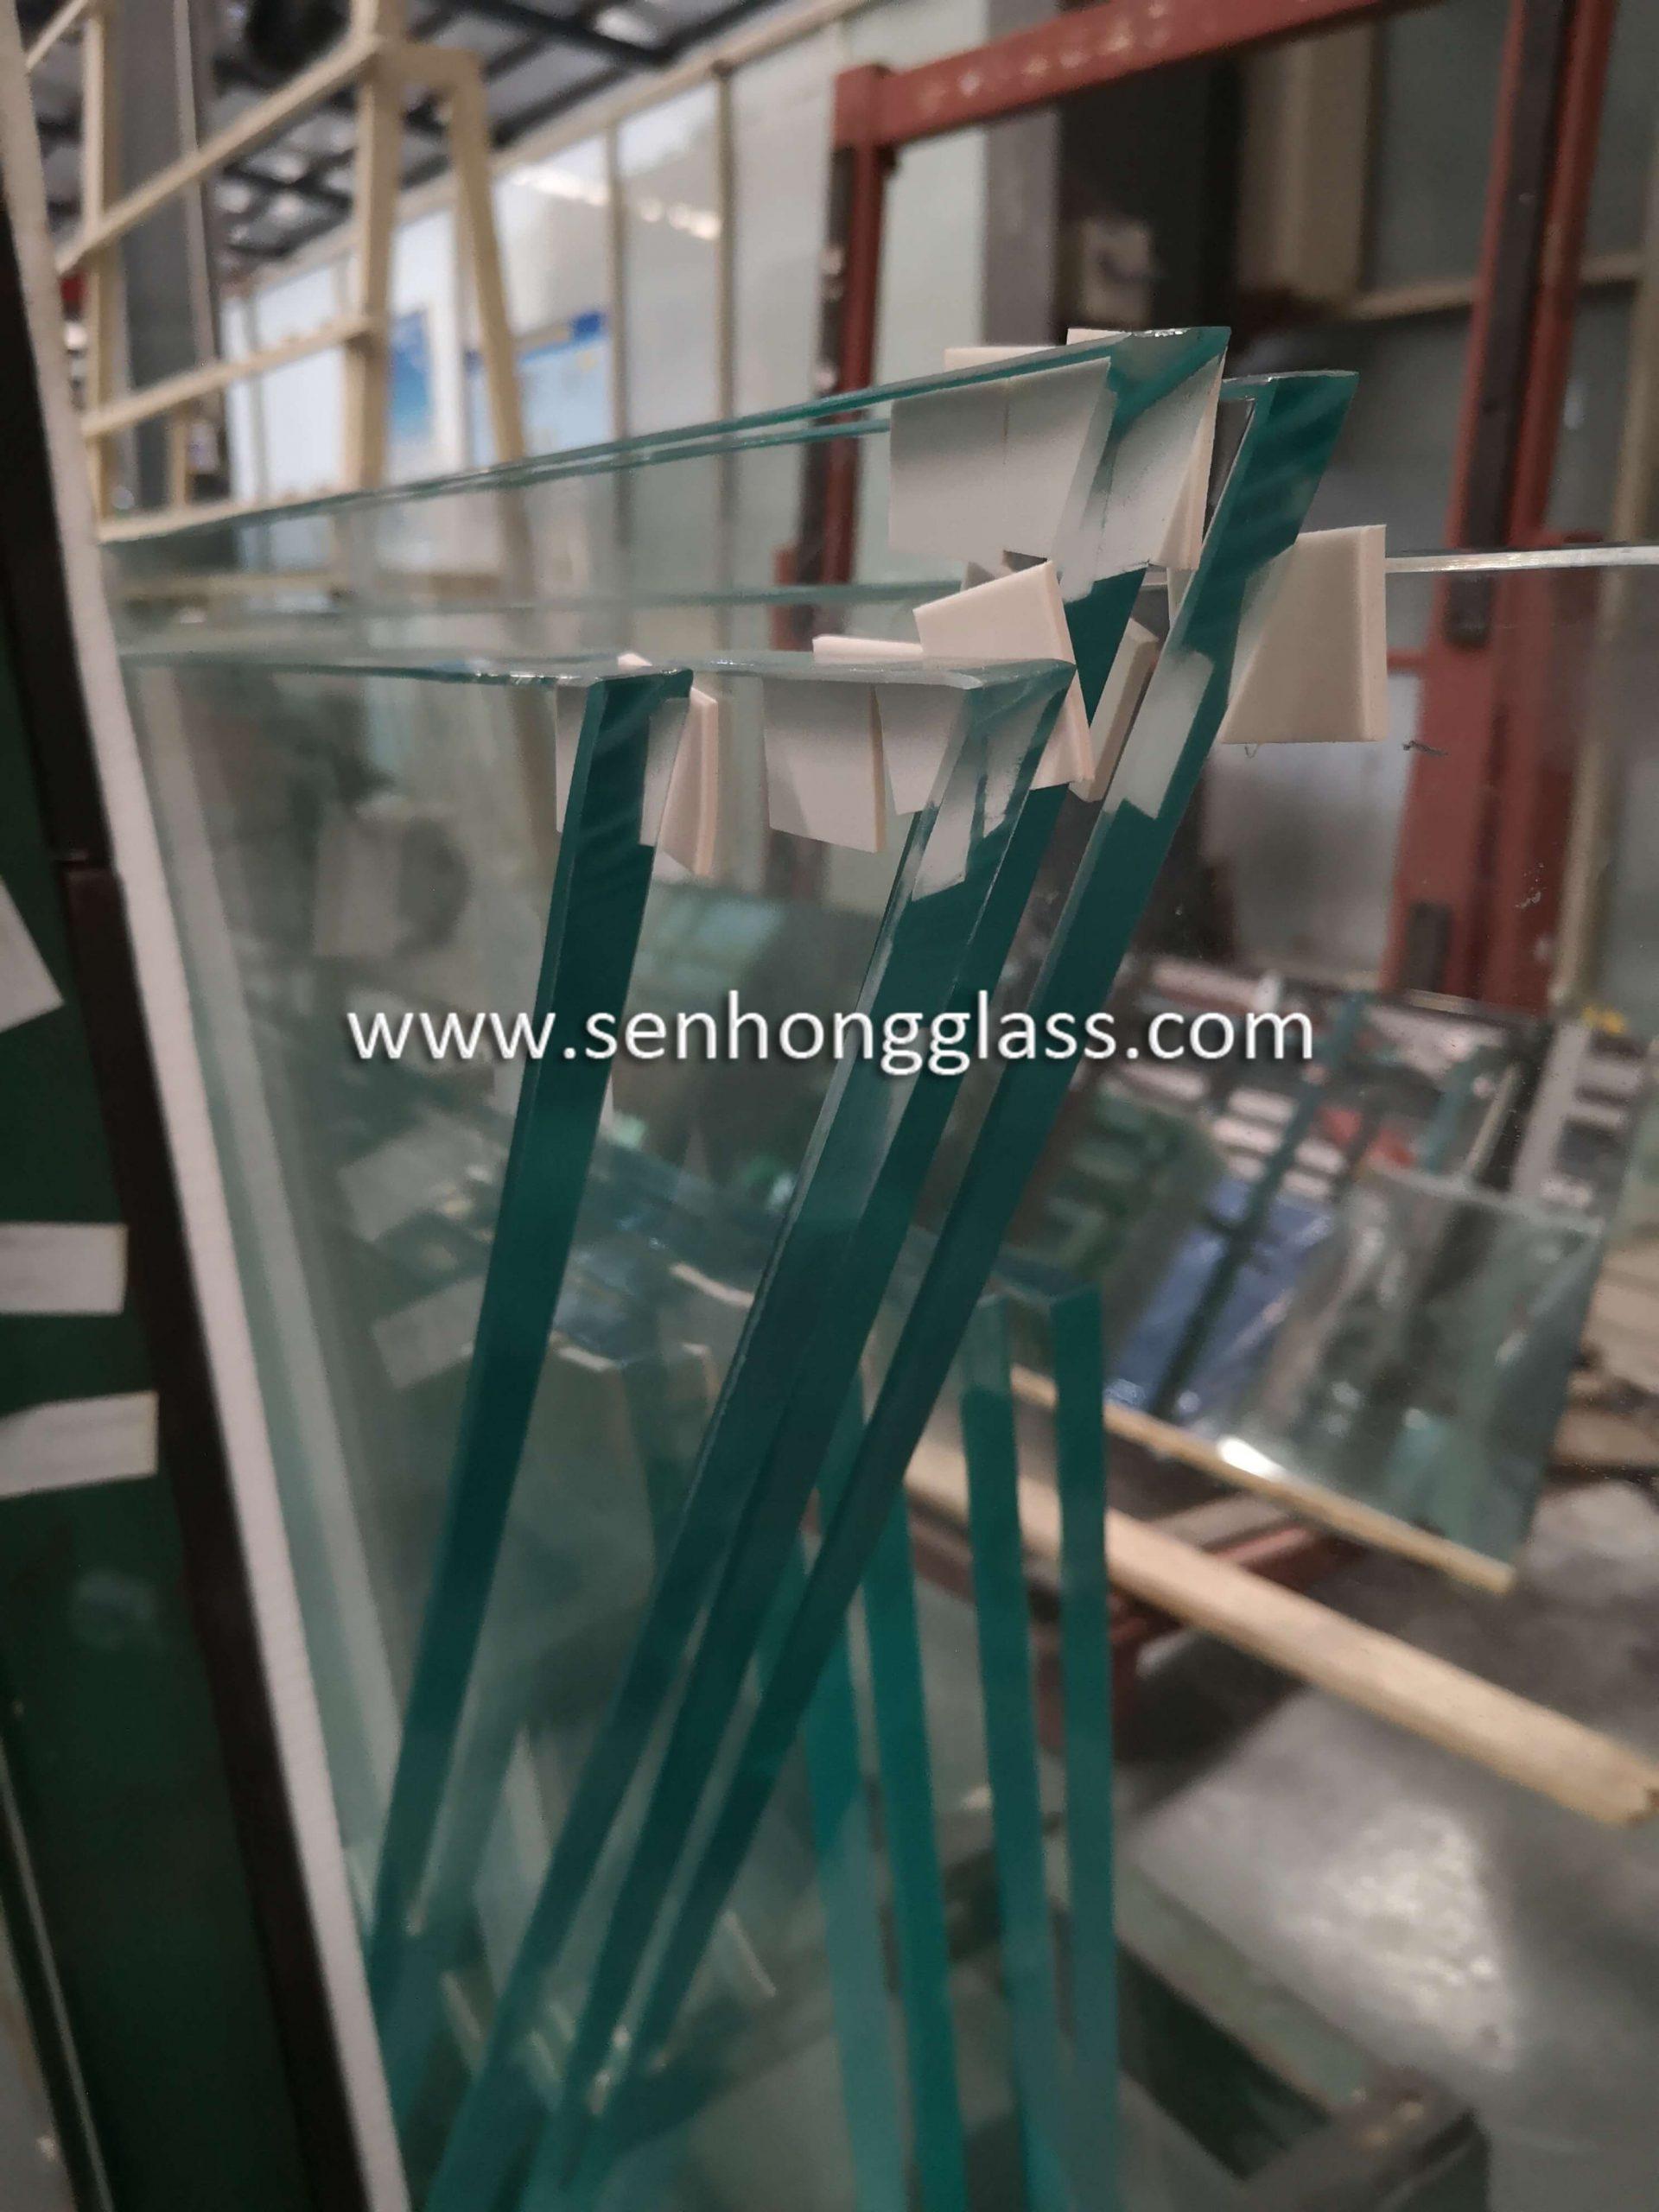 15mm-low-iron-extra-clear-tempered-glass-irregular-shape-China-Shandong-Senhong-Glass